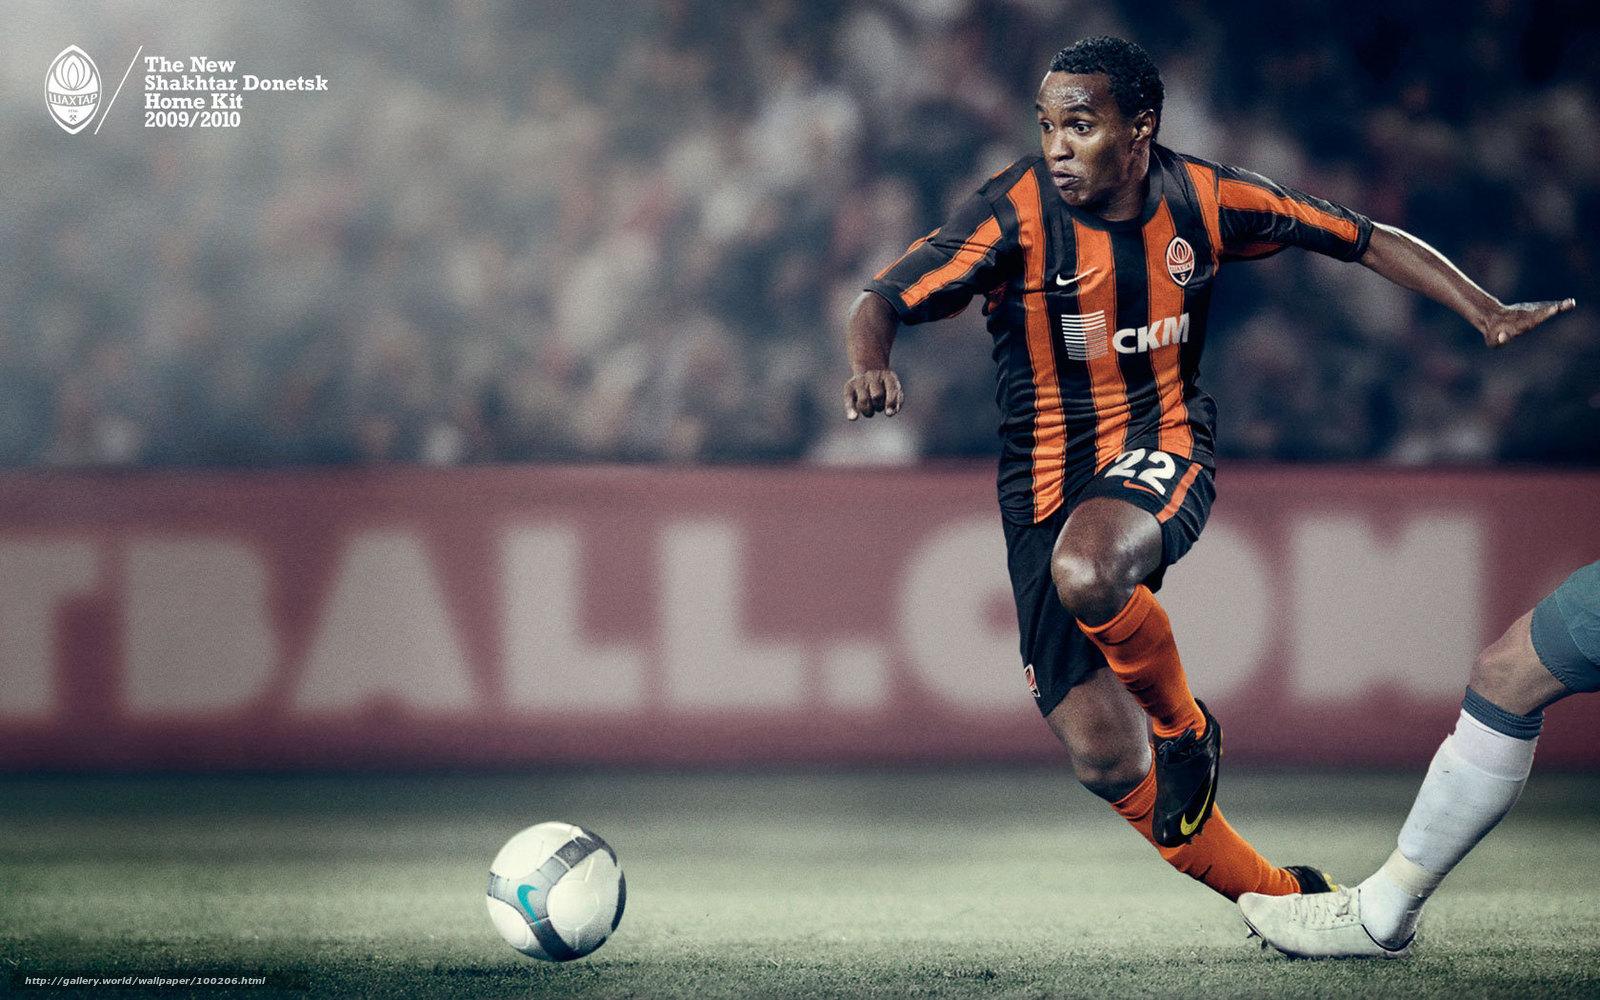 Download wallpaper FC Shakhtar Donetsk Luiz Adriano free desktop